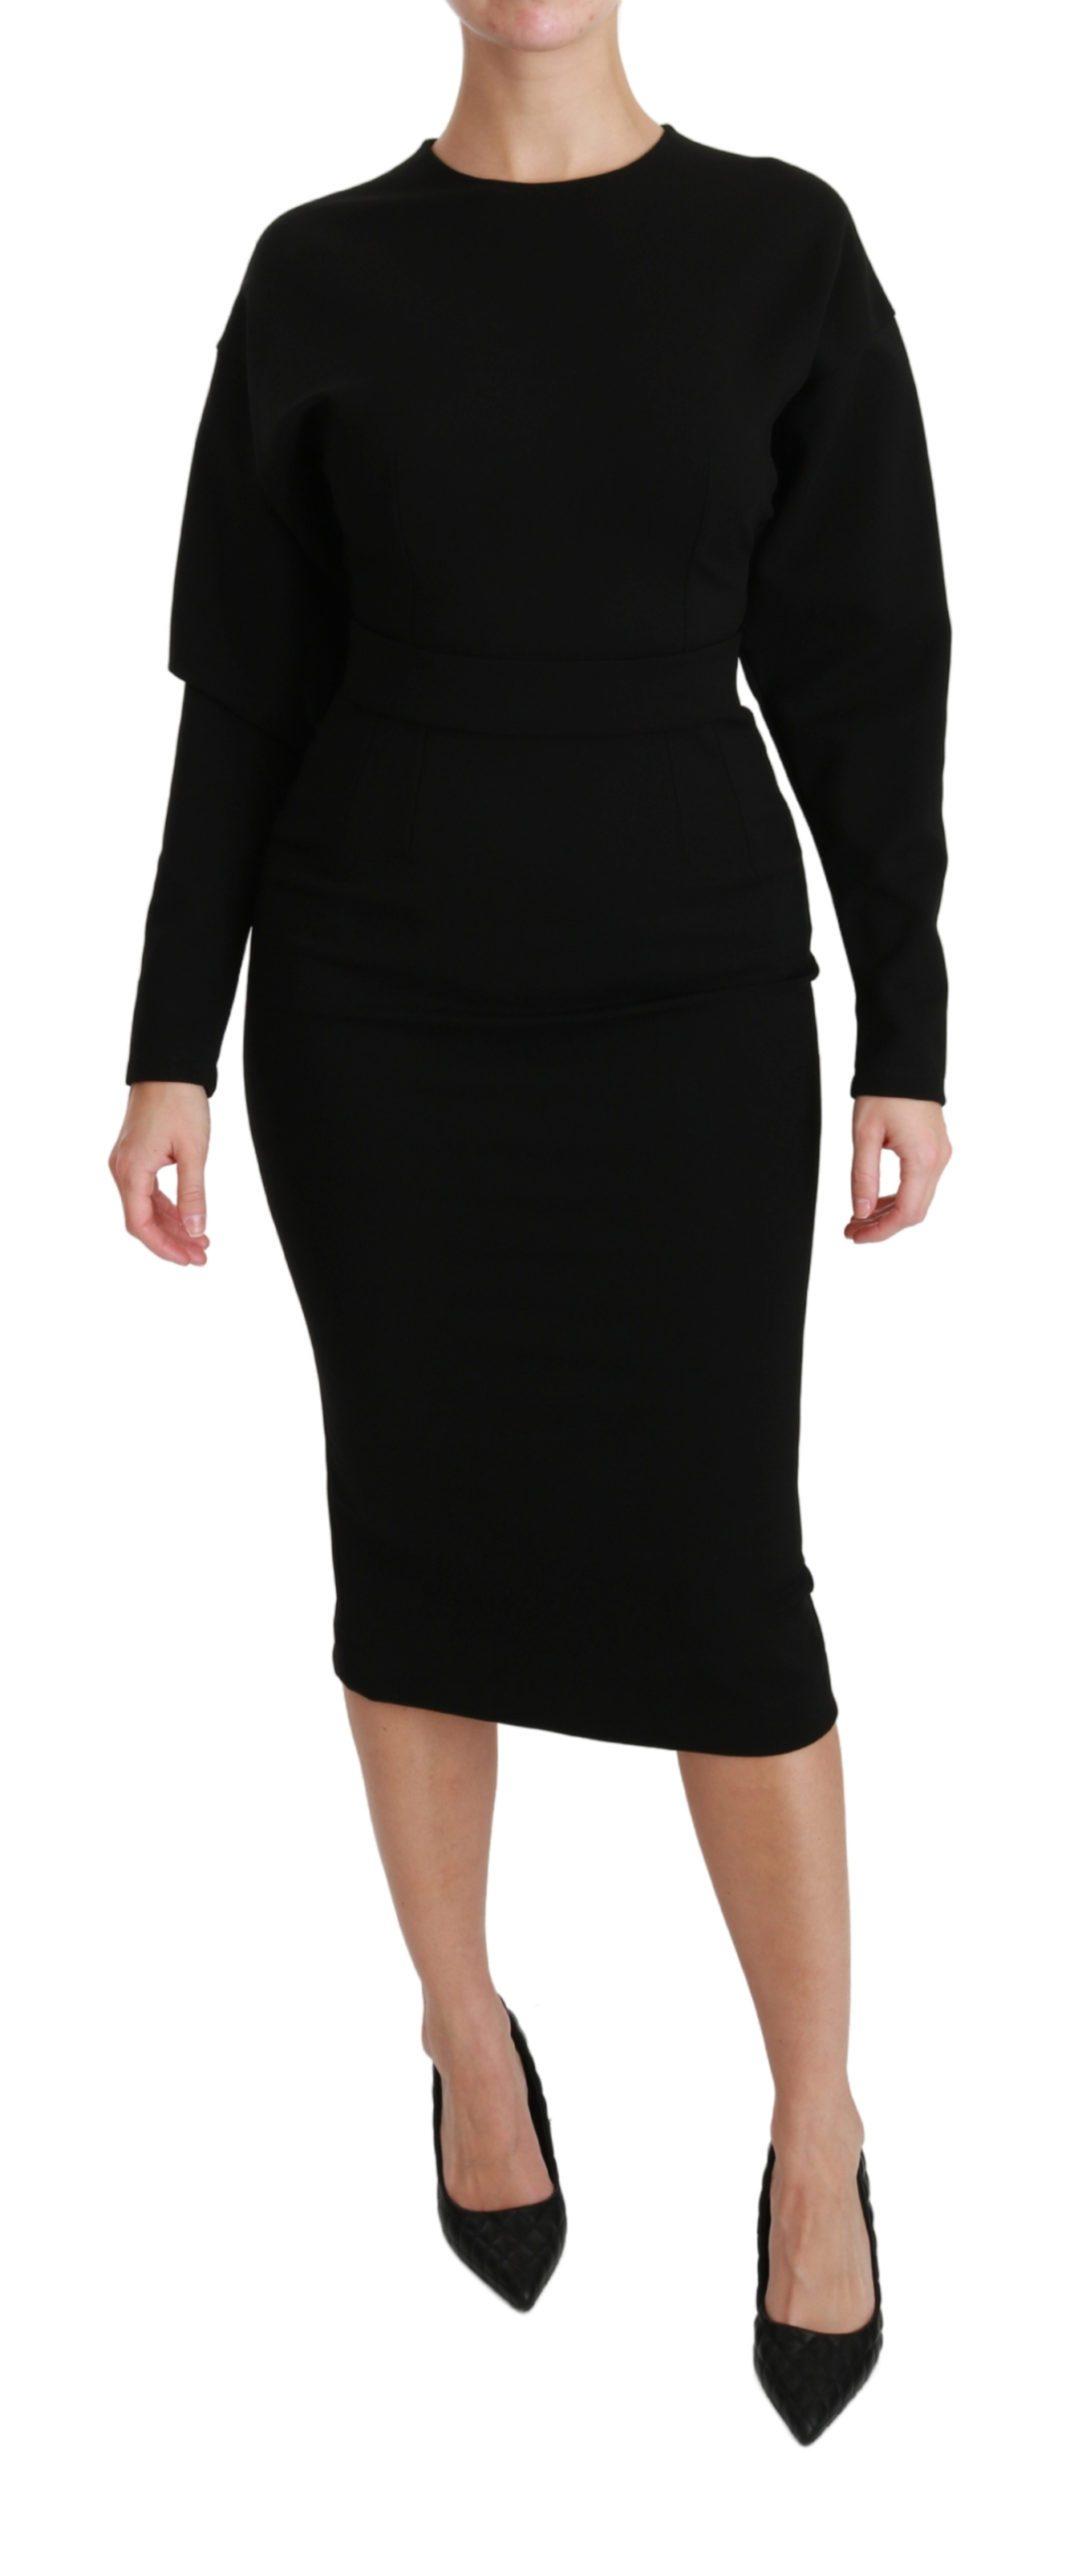 Dolce & Gabbana Women's Sheath Midi Stretch Dress Black DR2543 - IT40 S